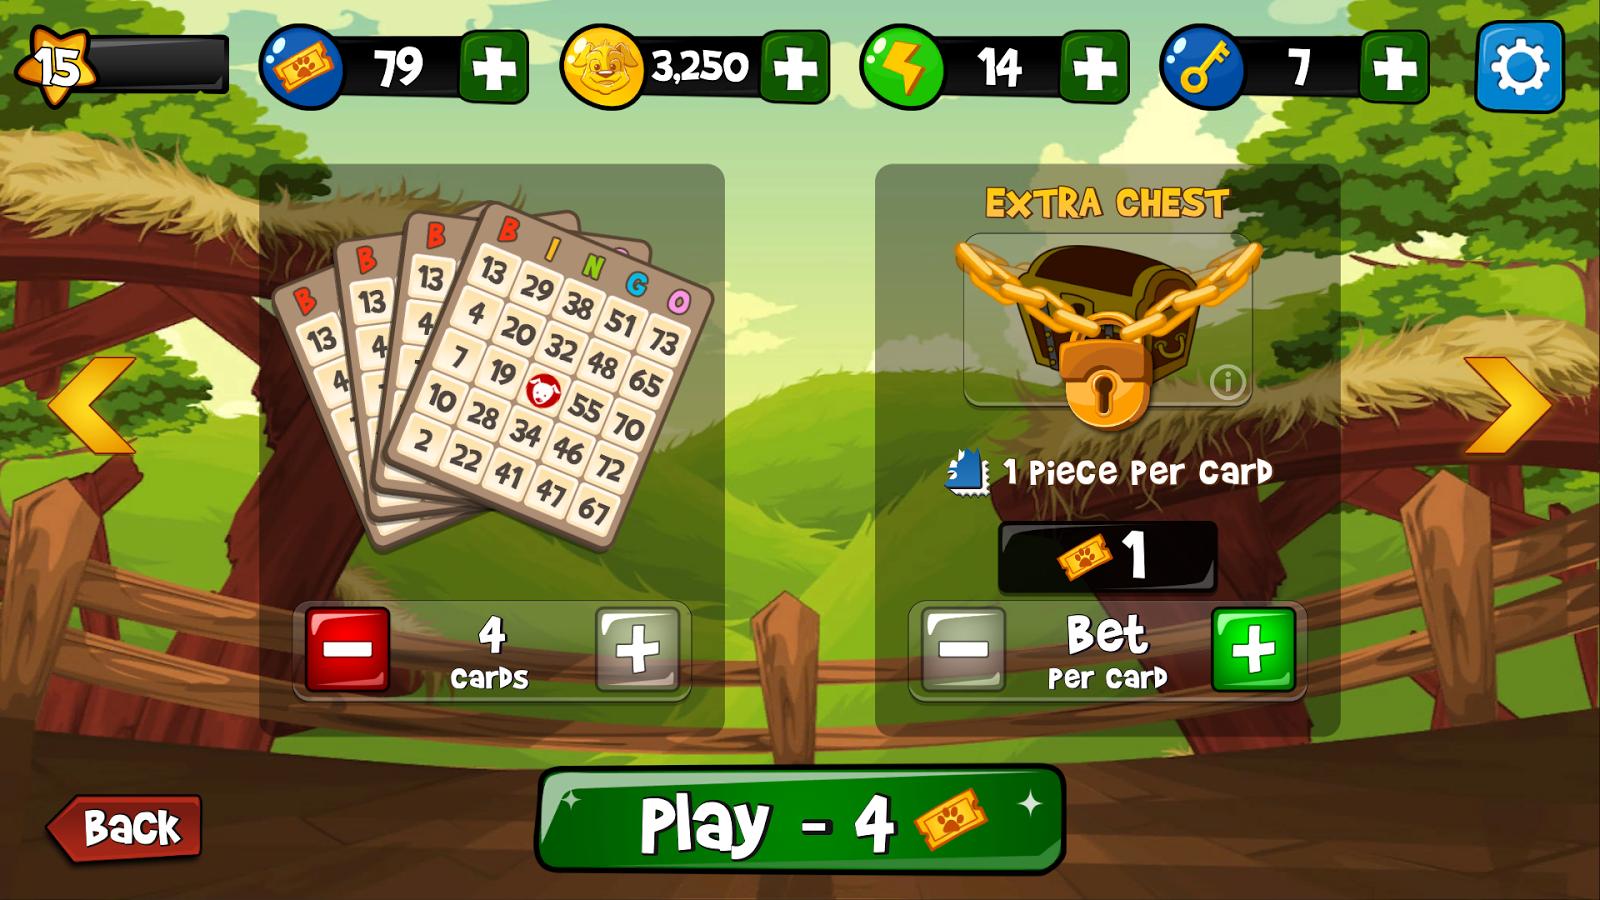 Abradoodle bingo free for kindle